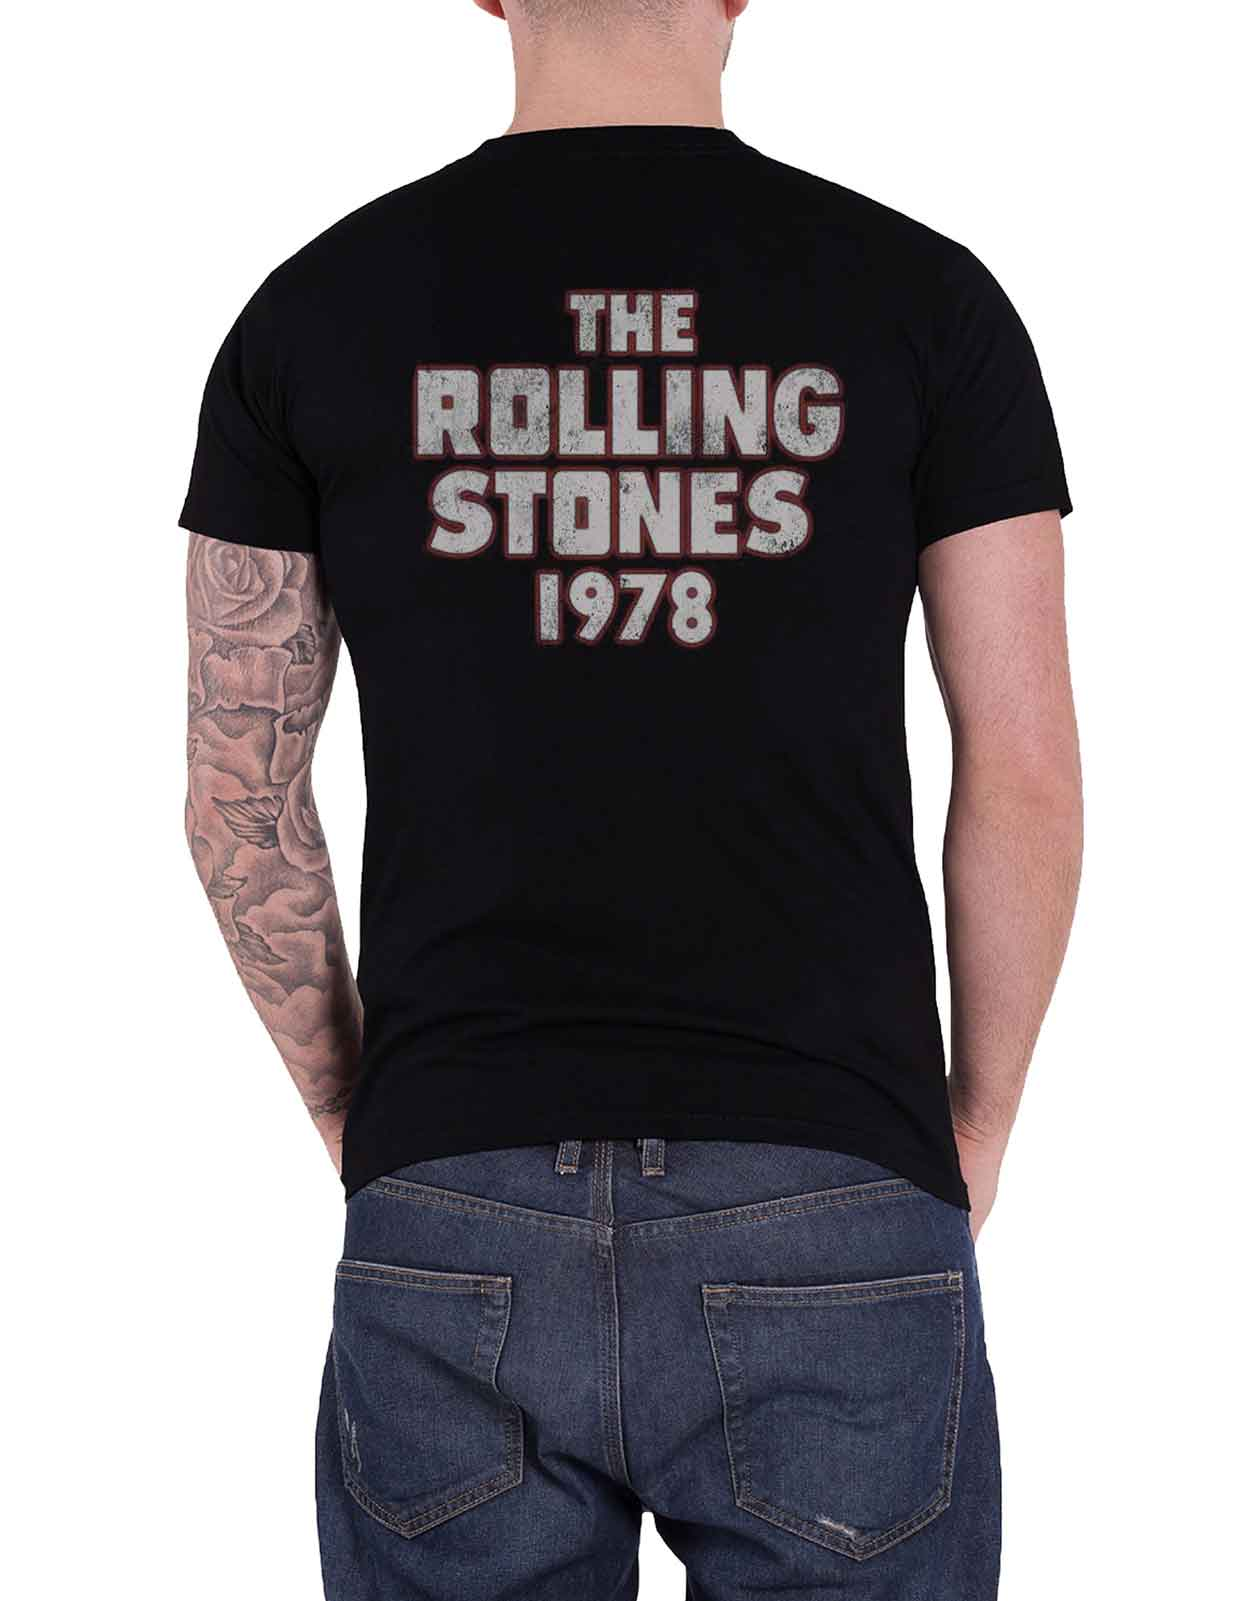 The-Rolling-Stones-T-Shirt-band-logo-No-Filter-tongue-tour-Jagger-Keith-mens